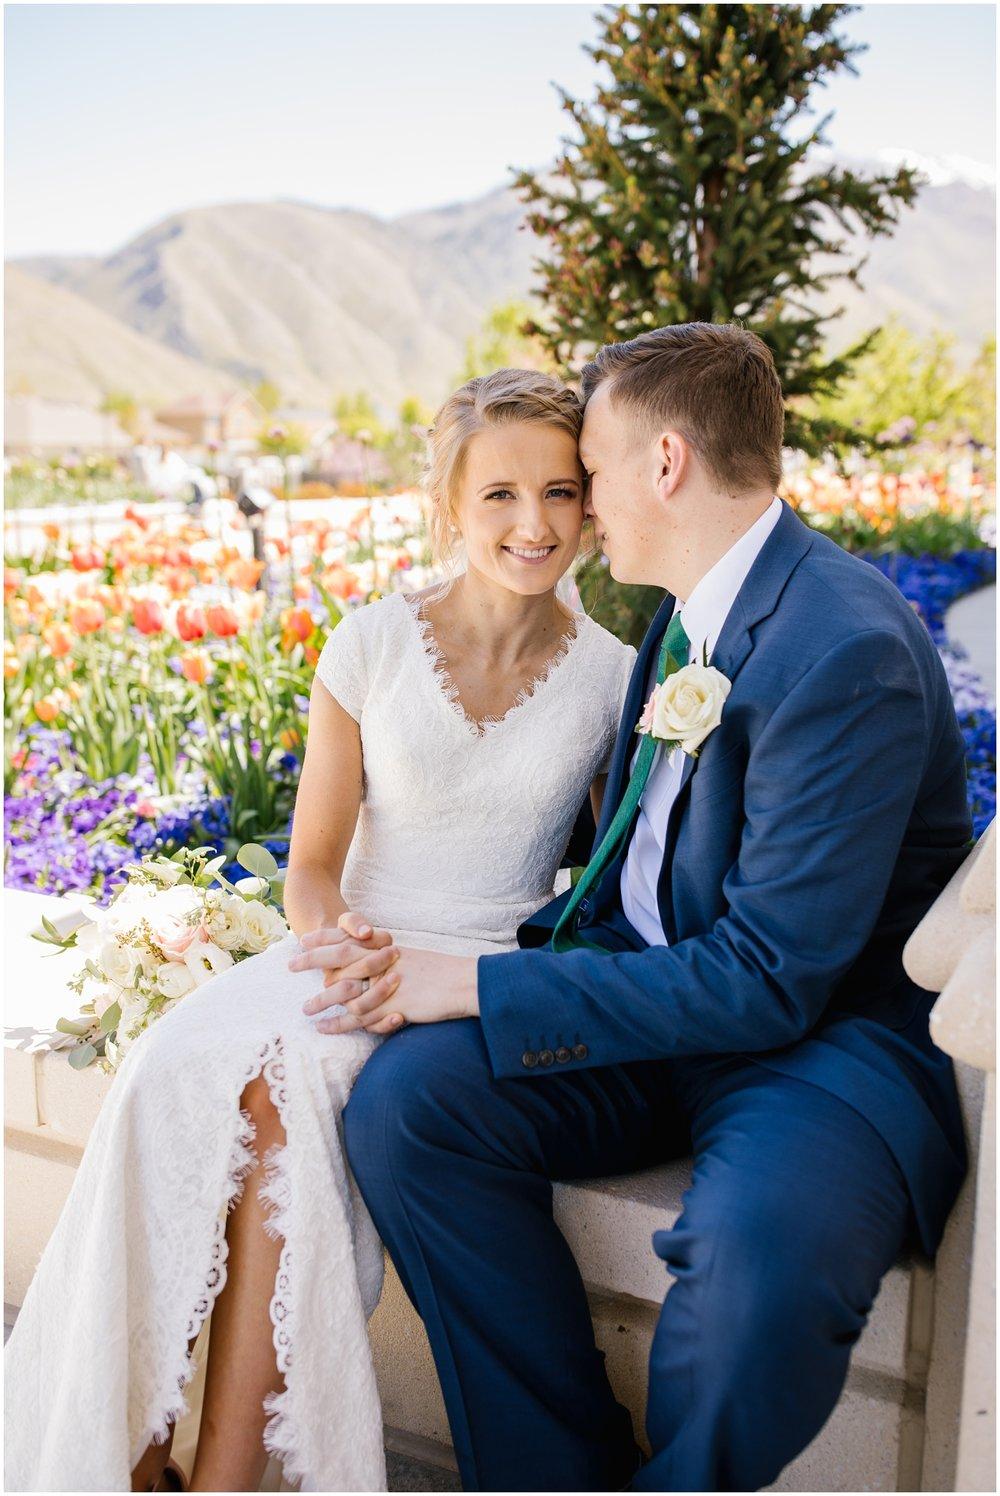 TA-Wedding-141_Lizzie-B-Imagery-Utah-Wedding-Photographer-Park-City-Salt-Lake-City-Thanksgiving-Point-Ashton-Gardens-Lehi-Utah.jpg